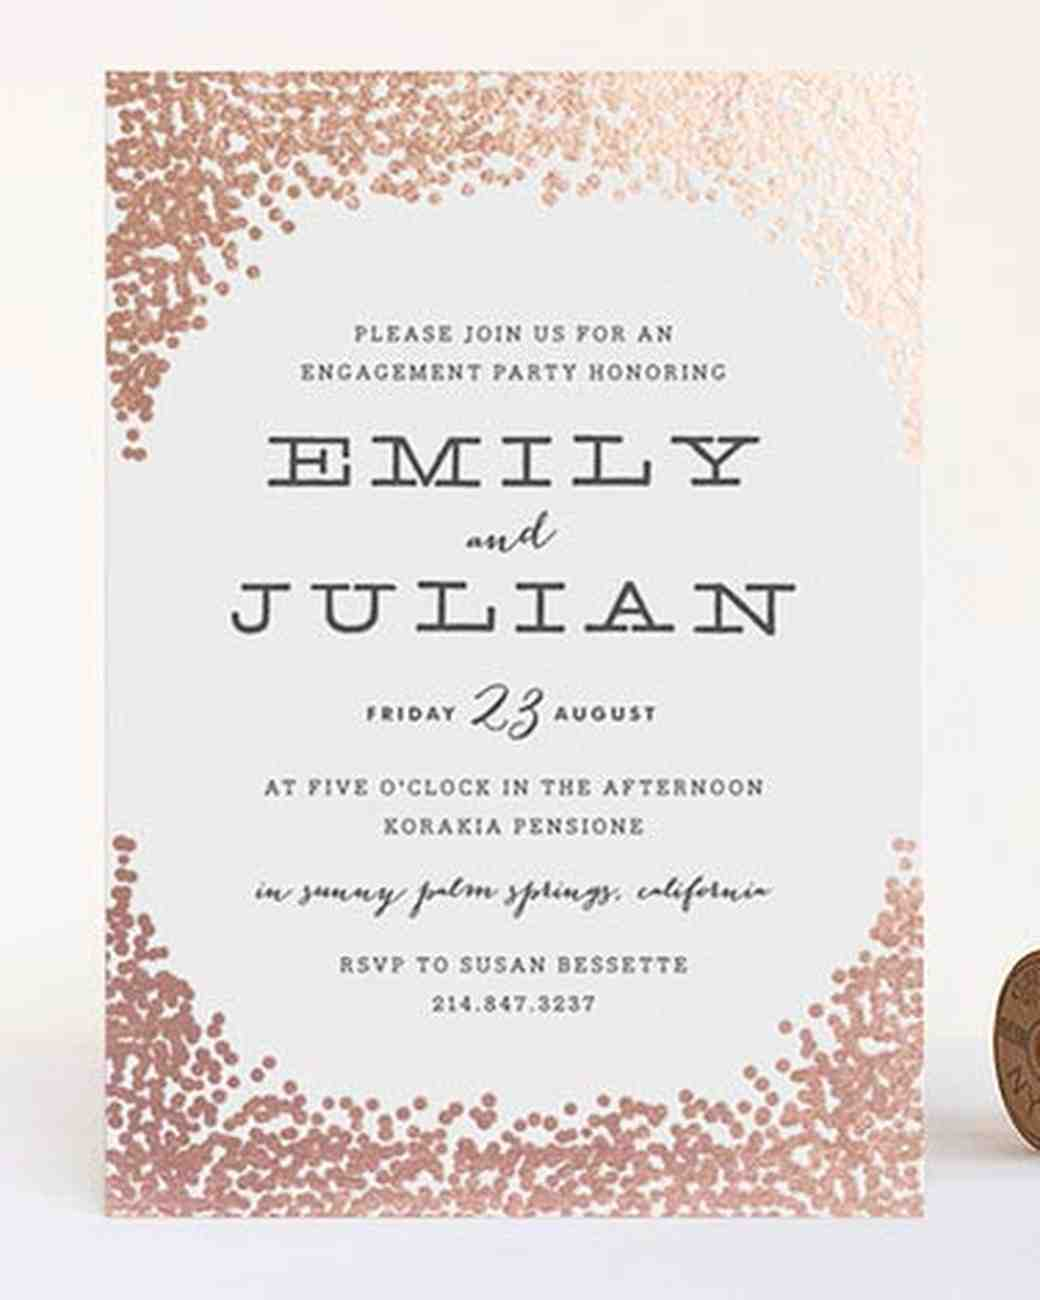 15 Engagement Party Invitations | Martha Stewart Weddings